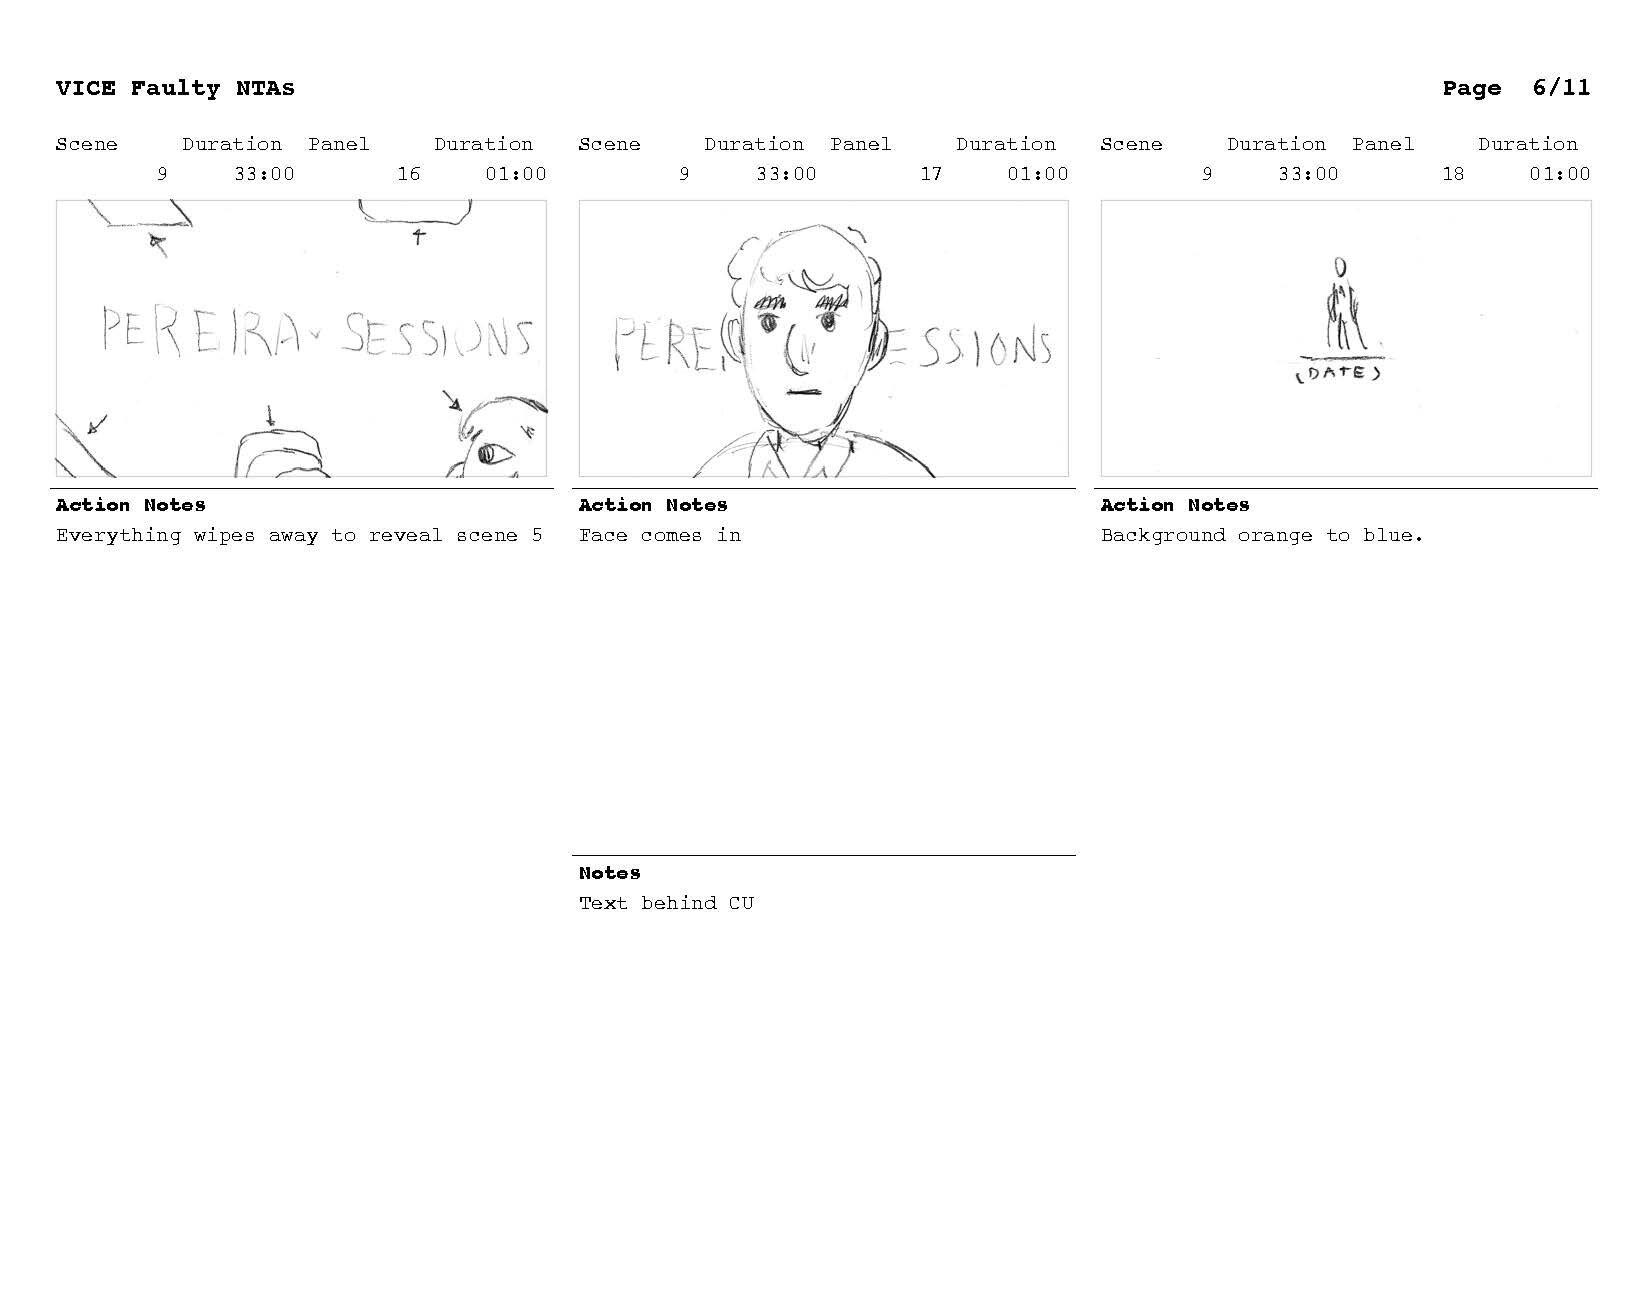 VICE News Tonight - Faulty NTAs storyboard_Page_06.jpg